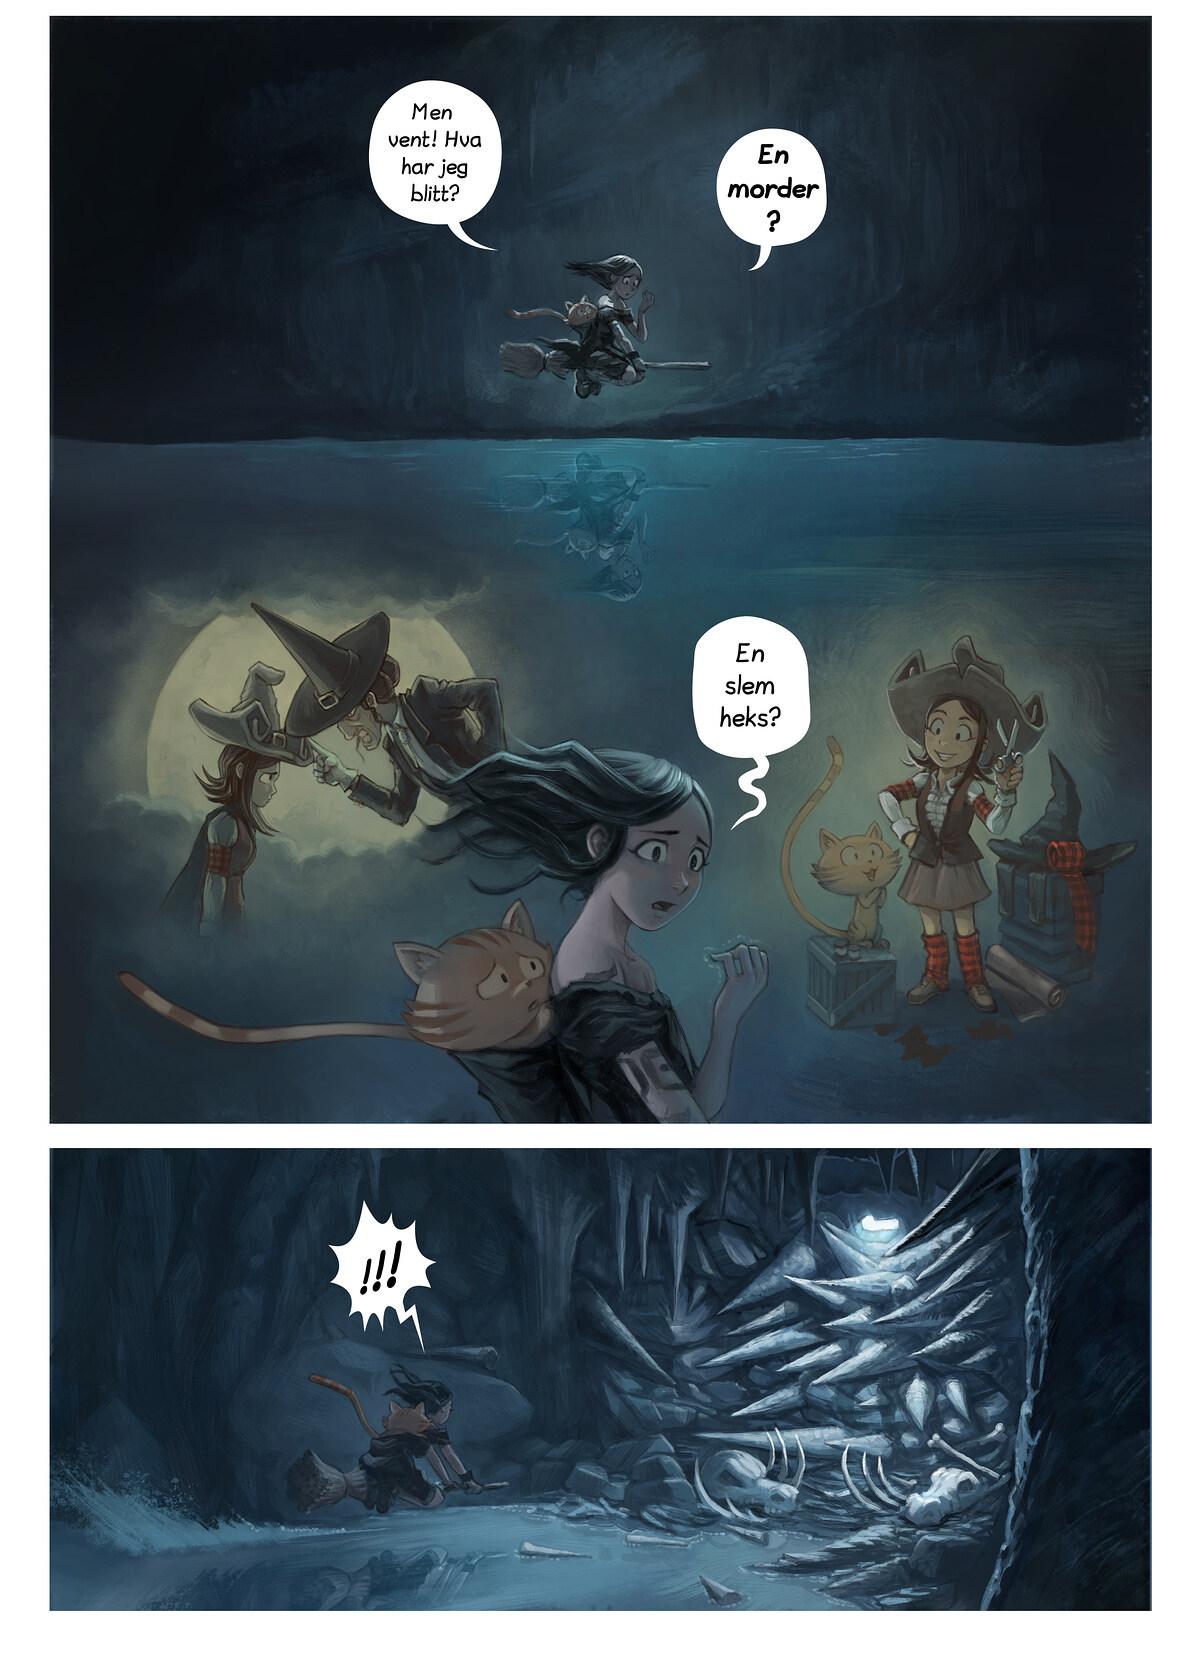 Episode 35: Tid for ettertanke, Page 8